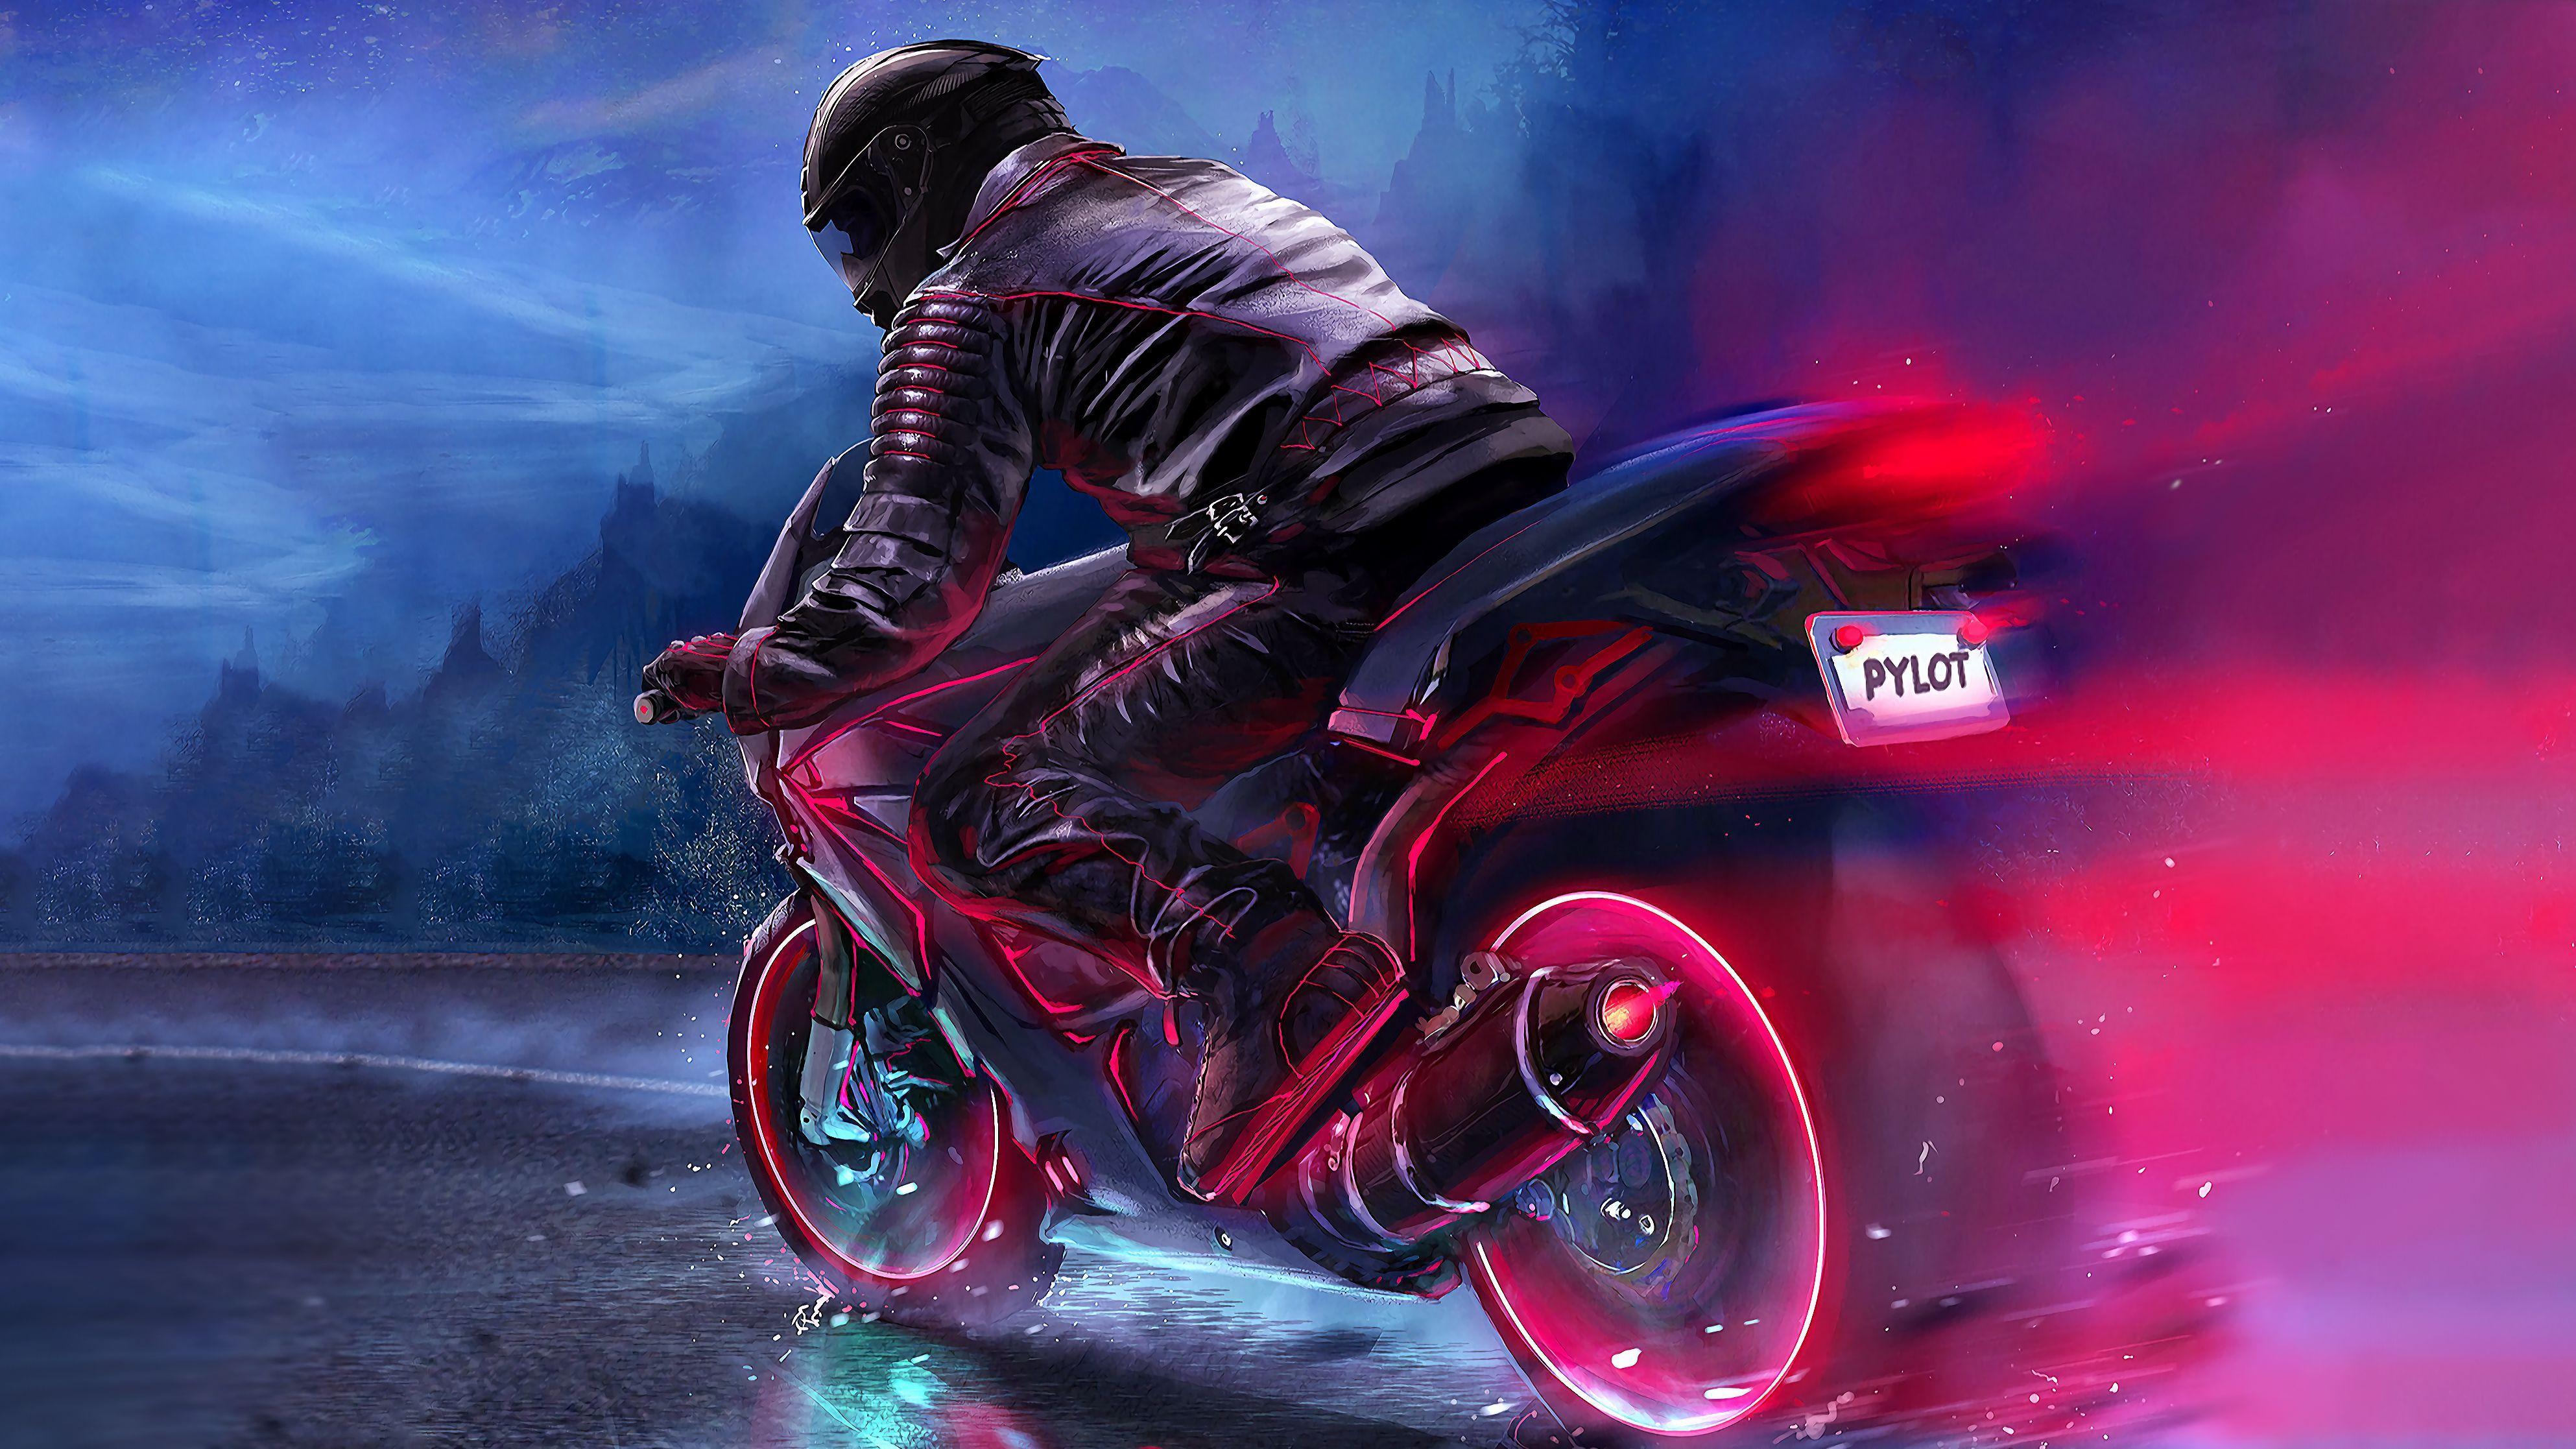 Bike Rider Wallpapers Top Free Bike Rider Backgrounds Wallpaperaccess